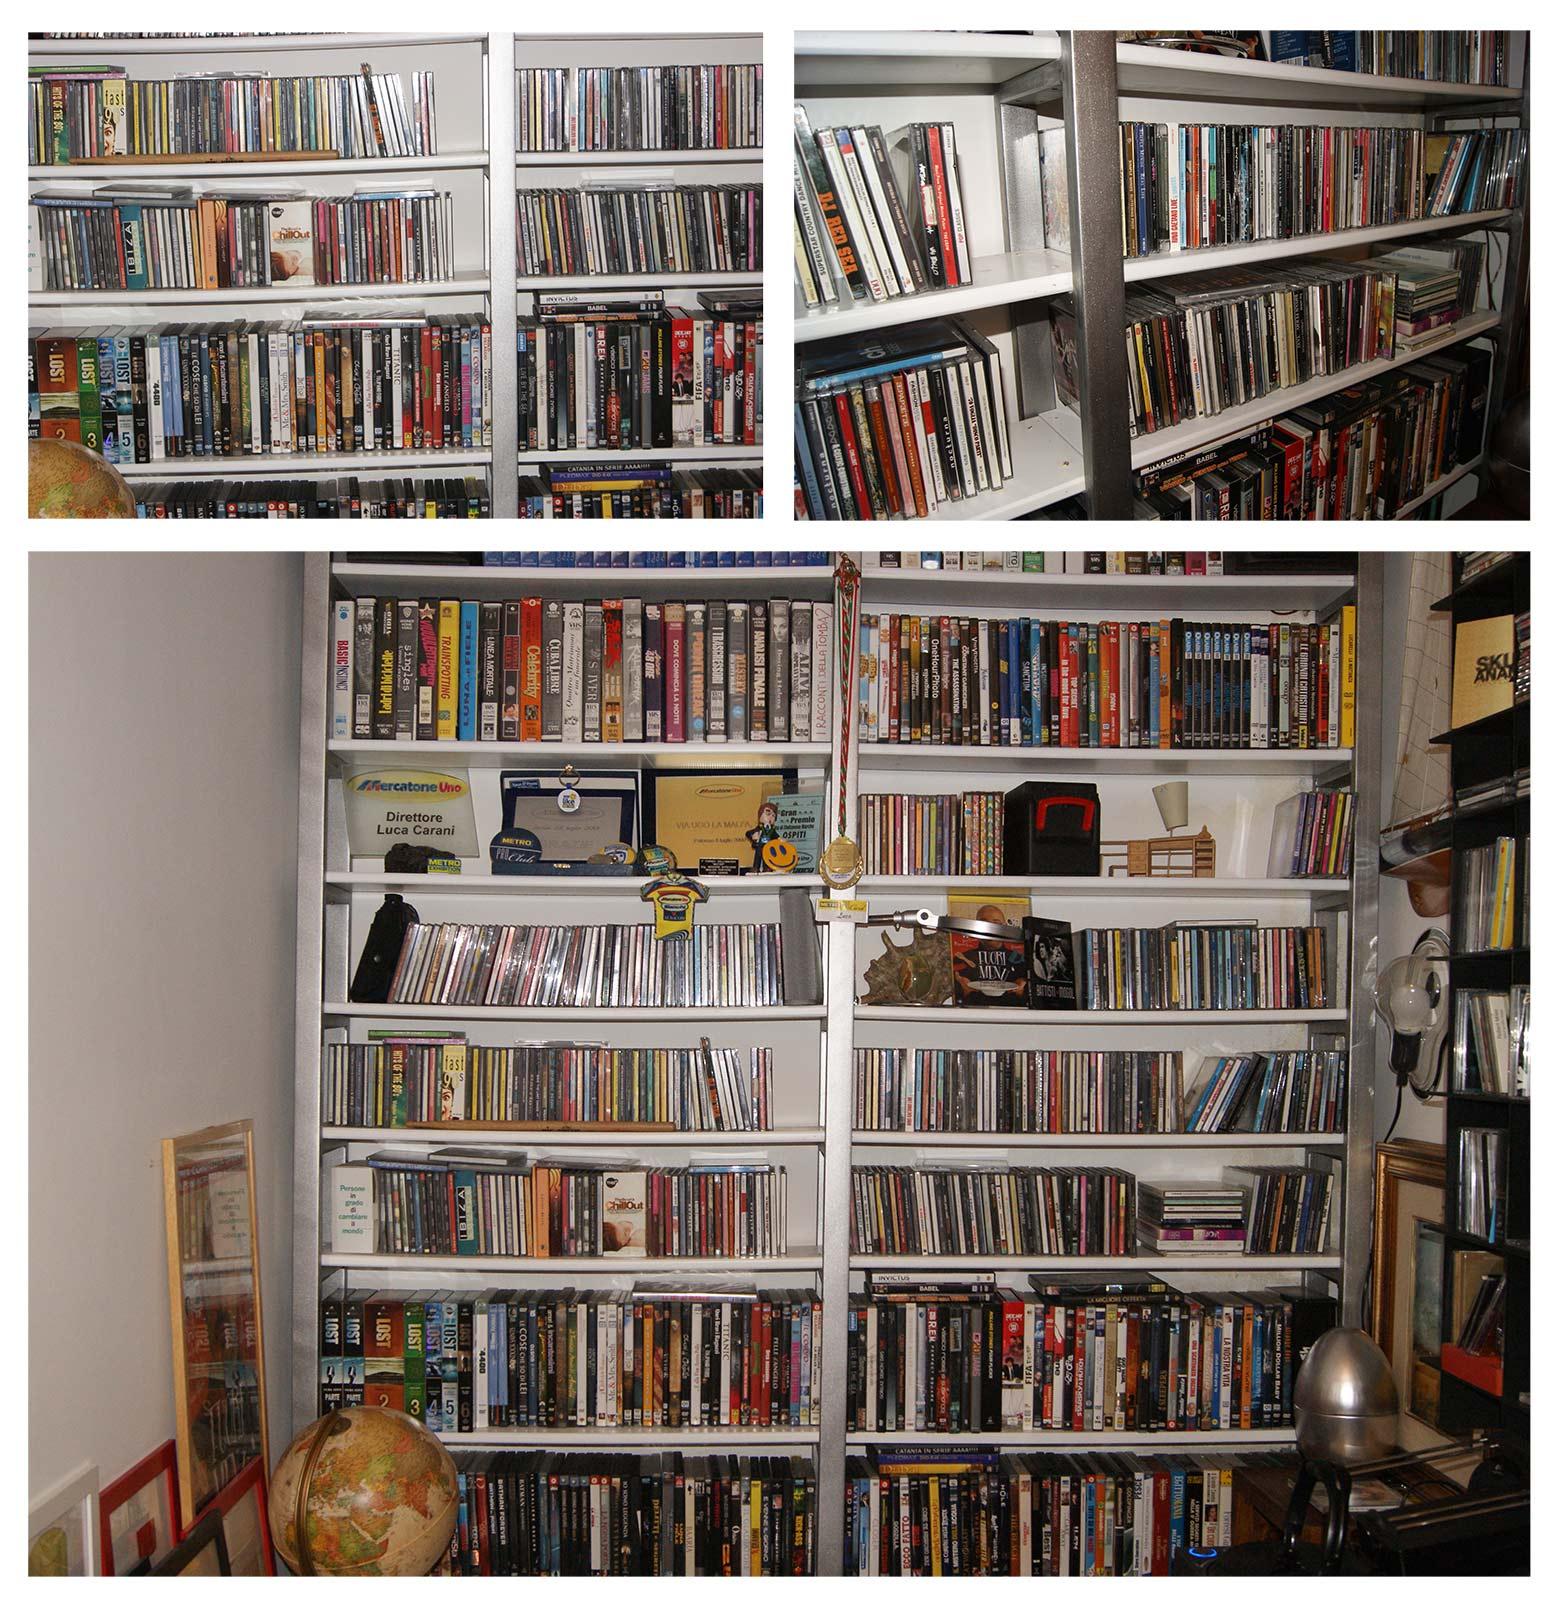 Libreria fai da te tutto per lei for Libreria fai da te